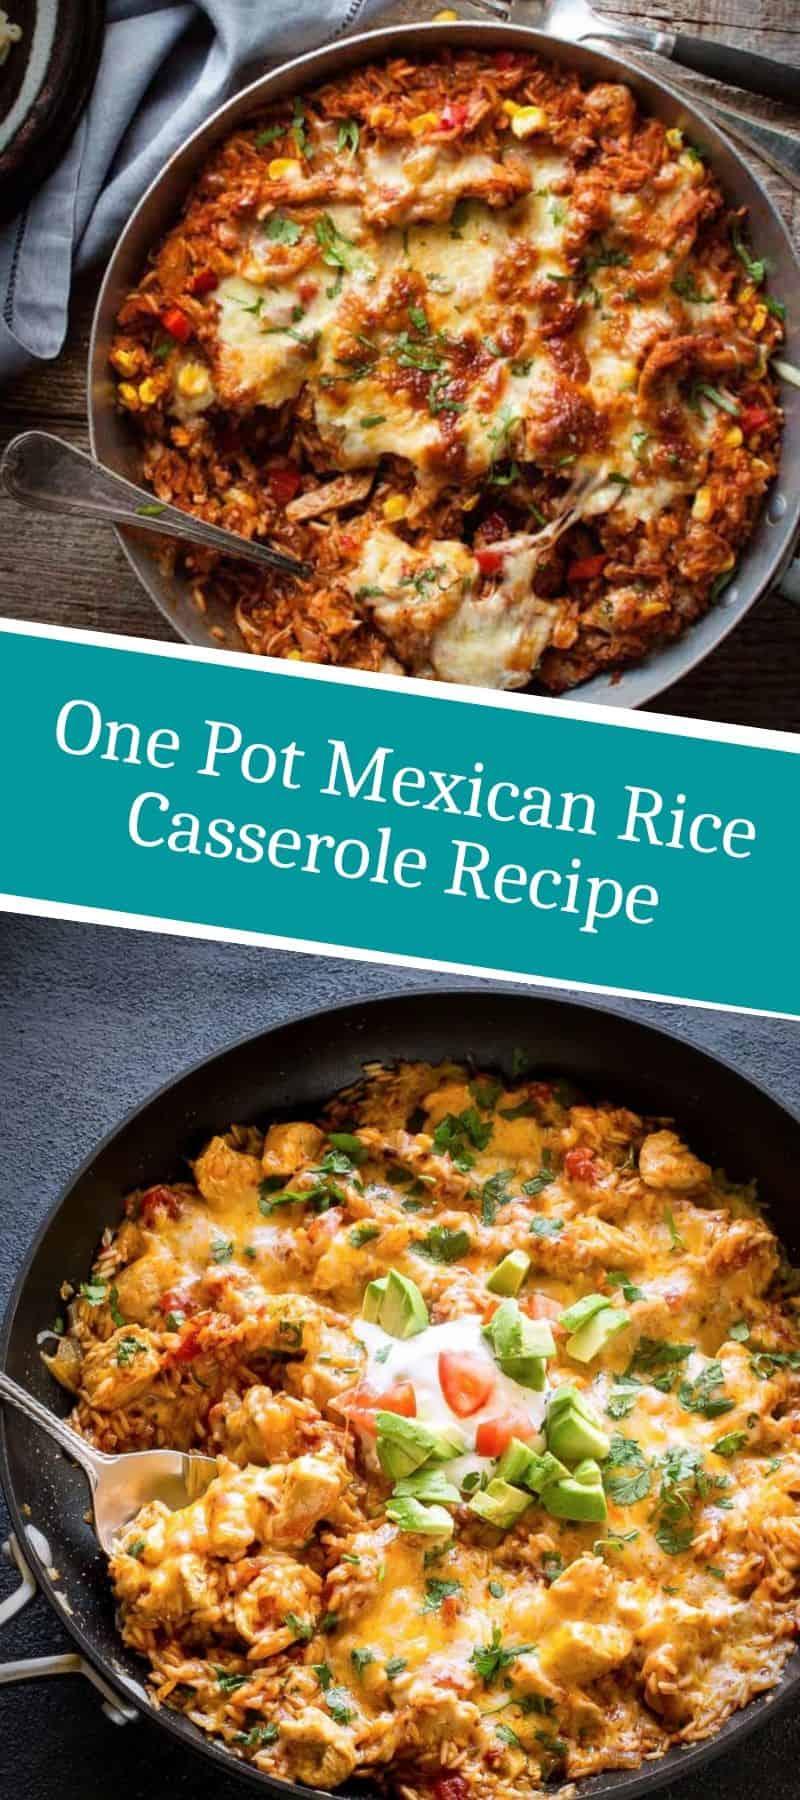 One Pot Mexican Rice Casserole Recipe 3